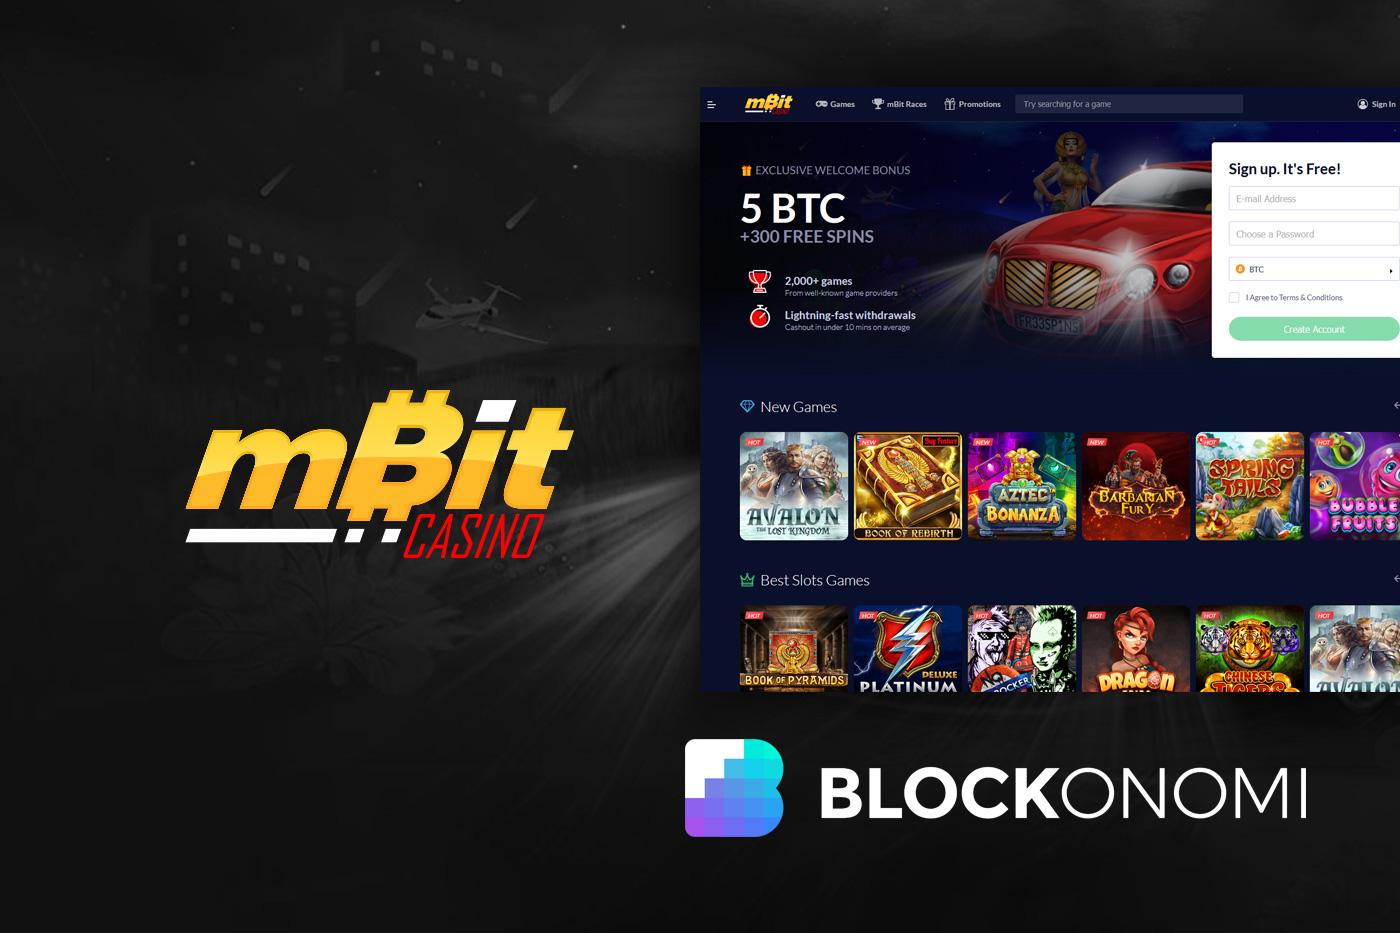 Kasino Bitcoin Tanpa Bonus Deposit